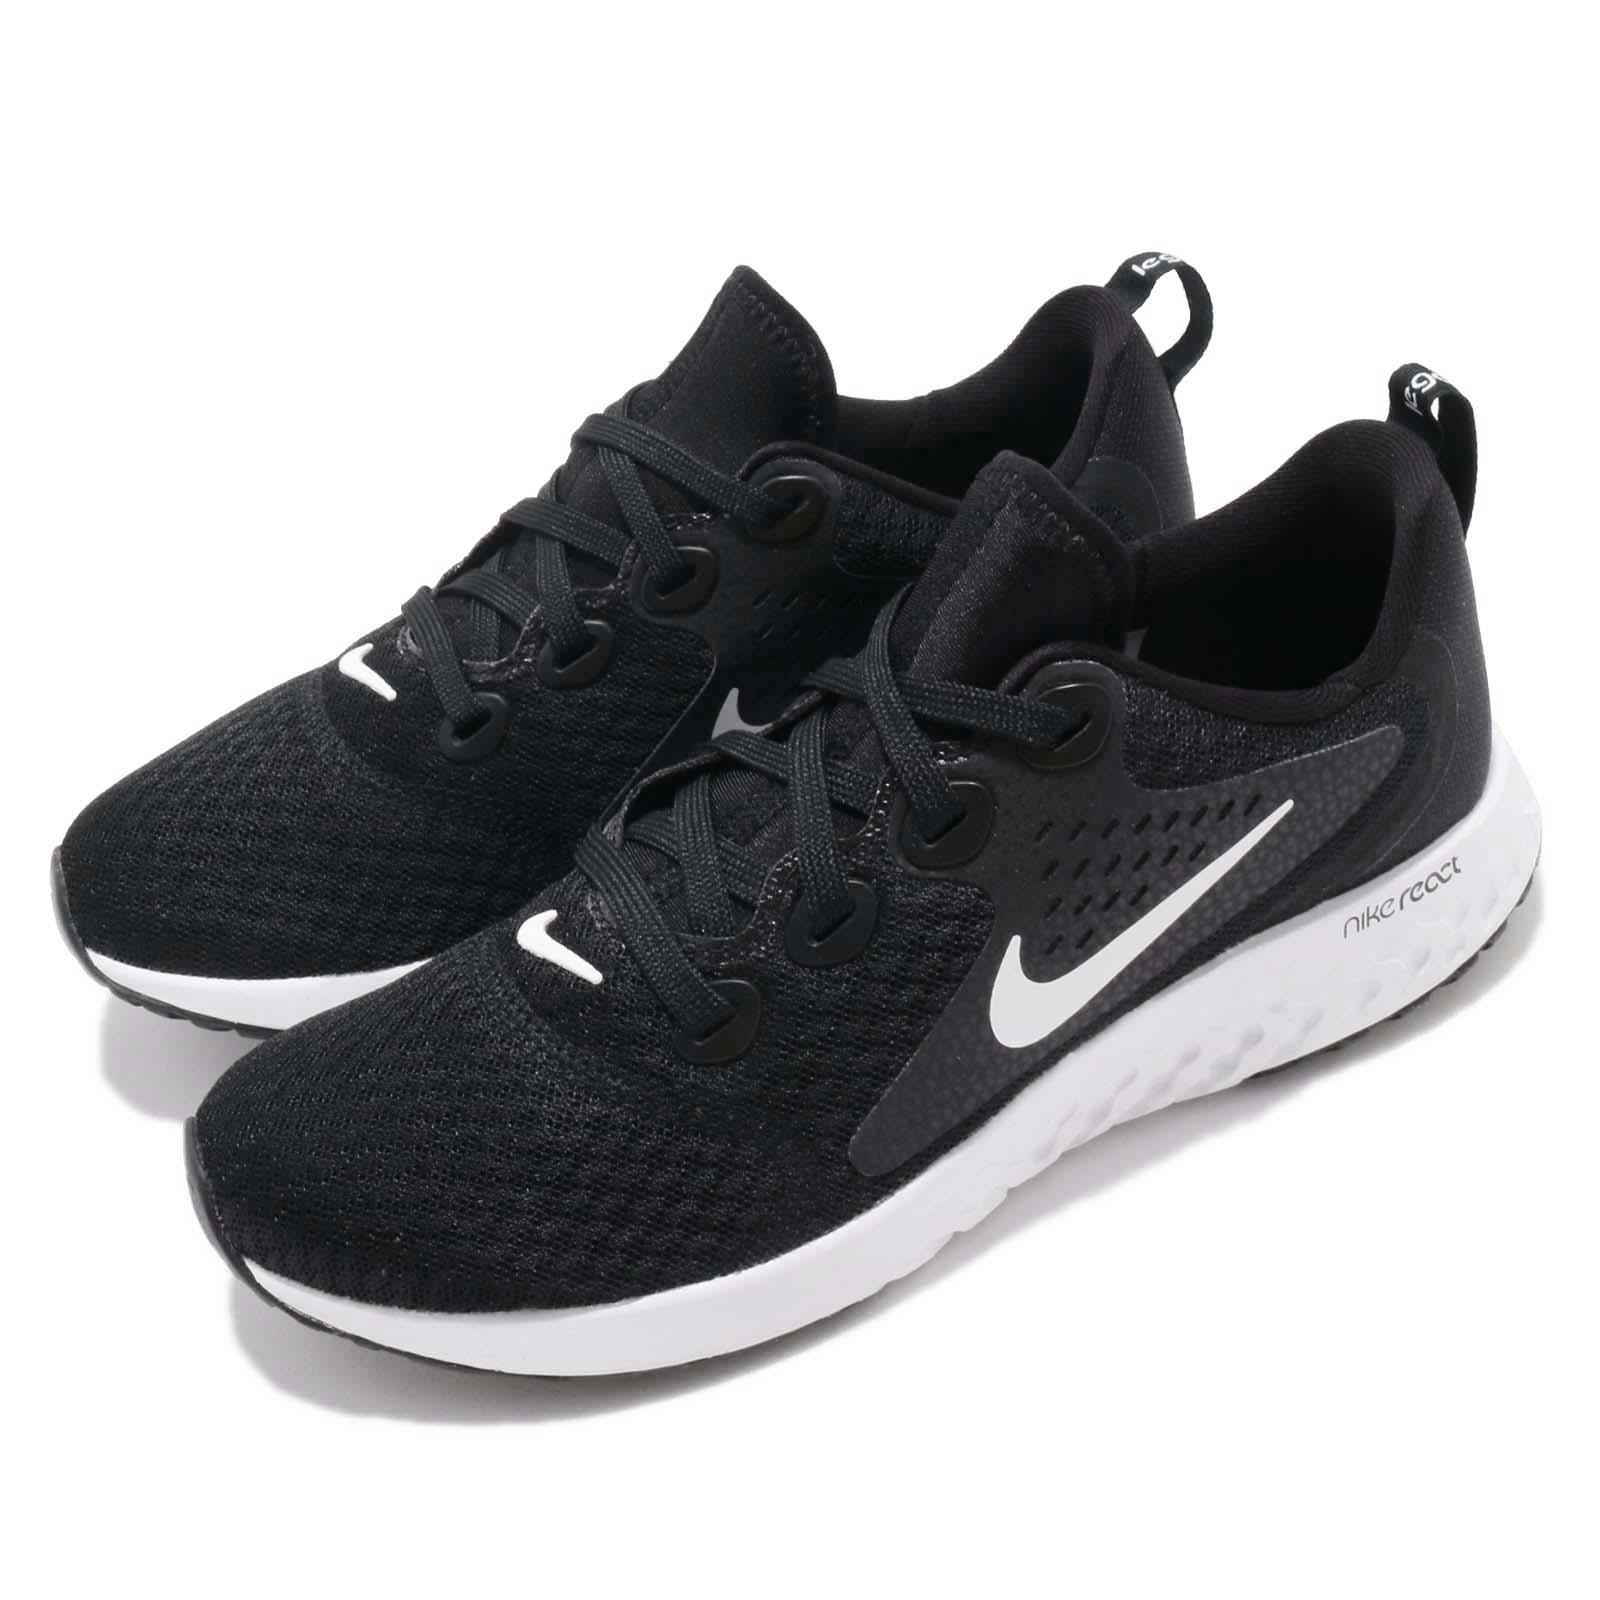 Nike 慢跑鞋 Legend React 女鞋 AH9438-001